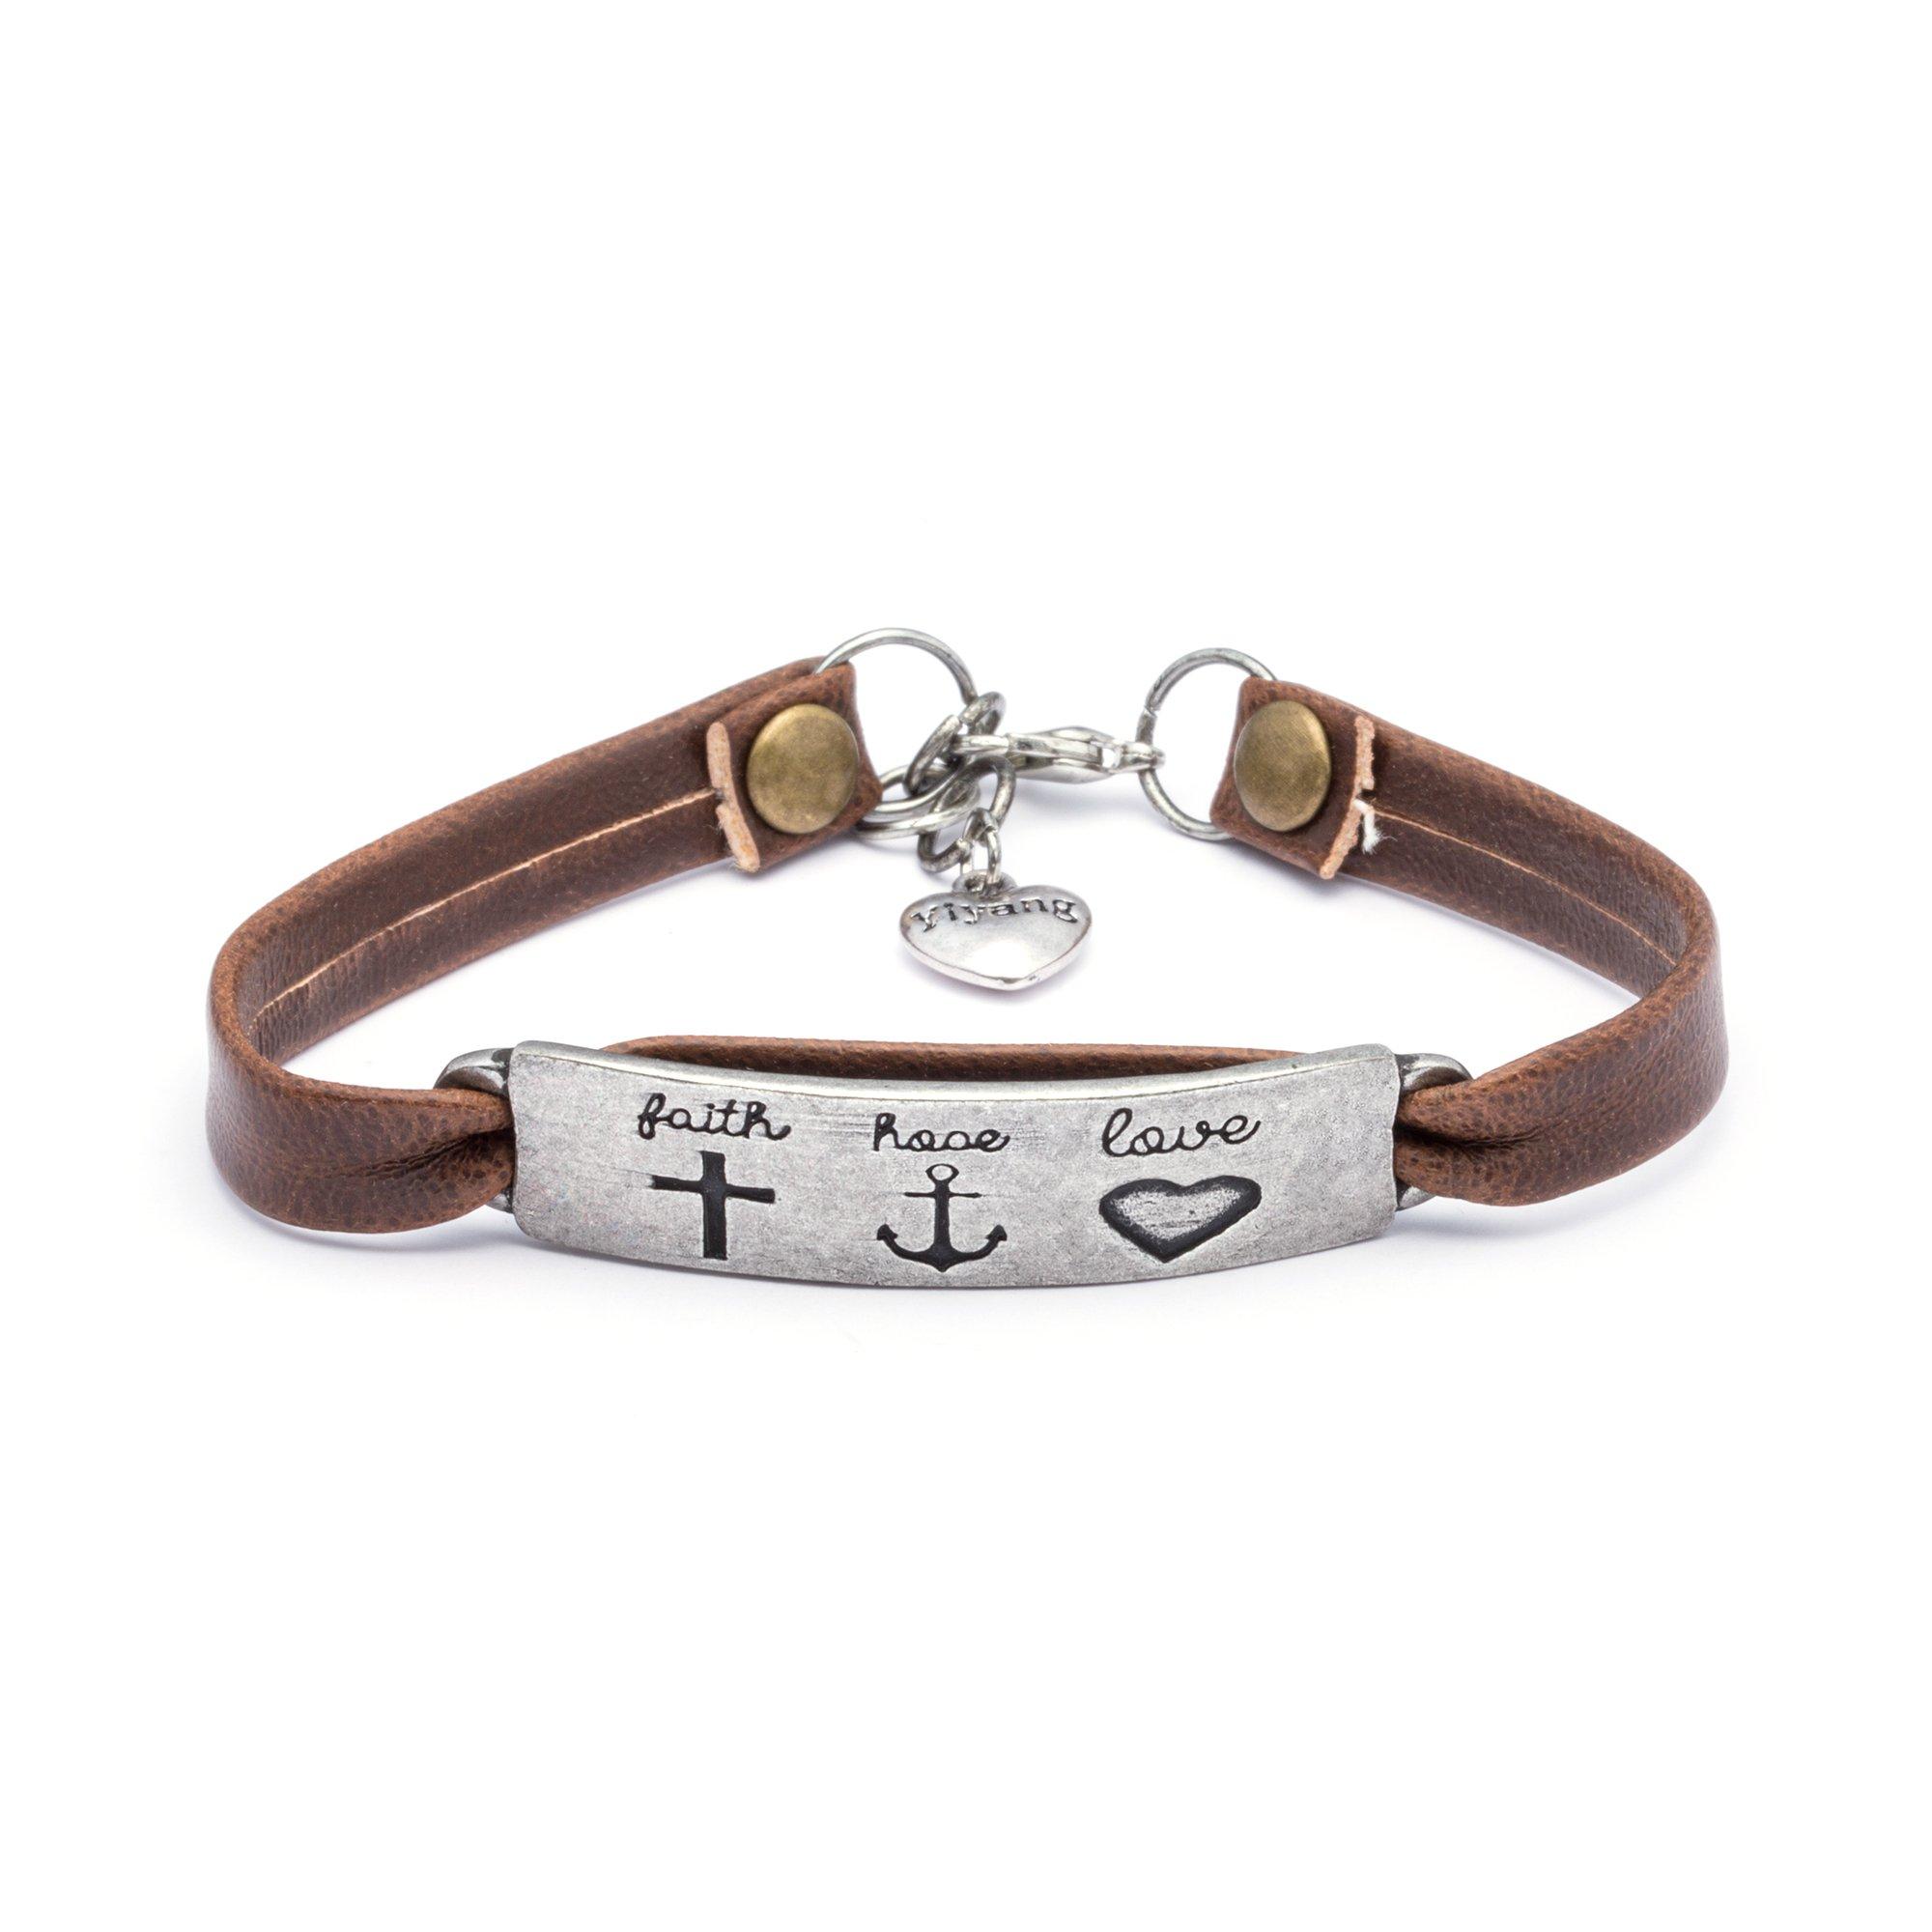 Yiyang Vintage Religion Bible Verse Leather Bangle Bracelet Easter Jewelry Gift Inspirational Bangle Faith Hope Love